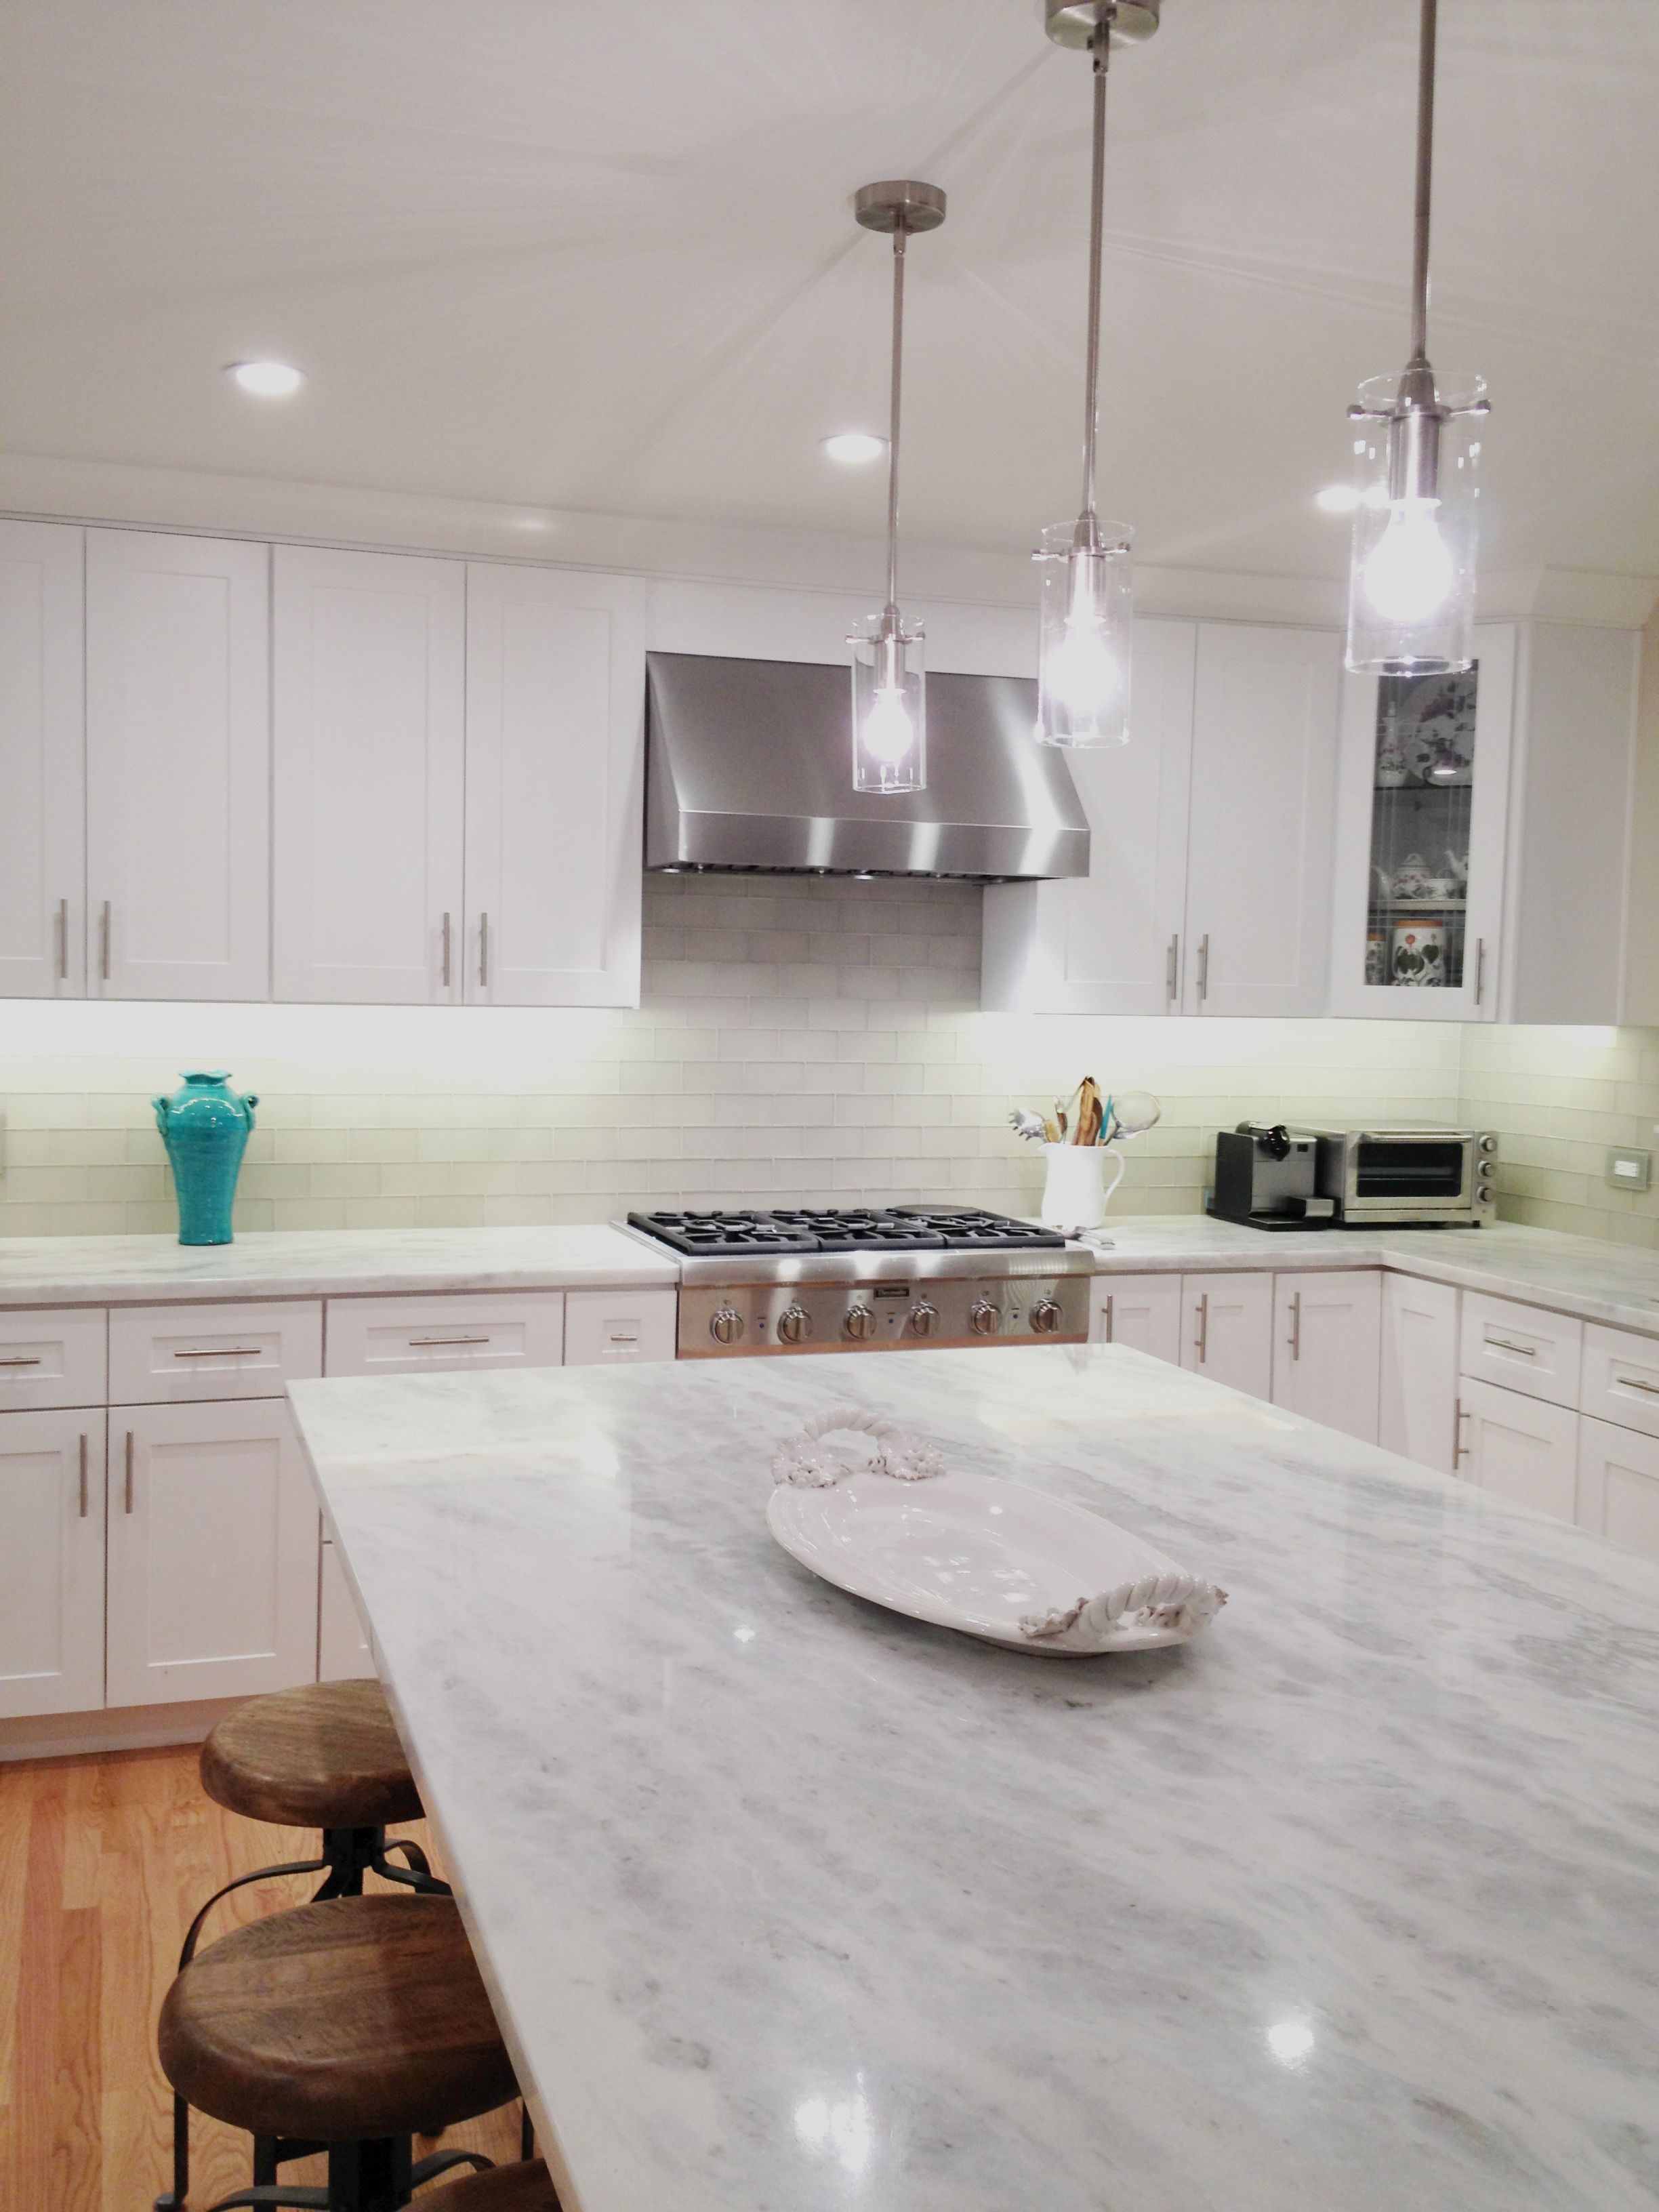 Prefab Namib Fantasy Quartzite kitchen counter with matte